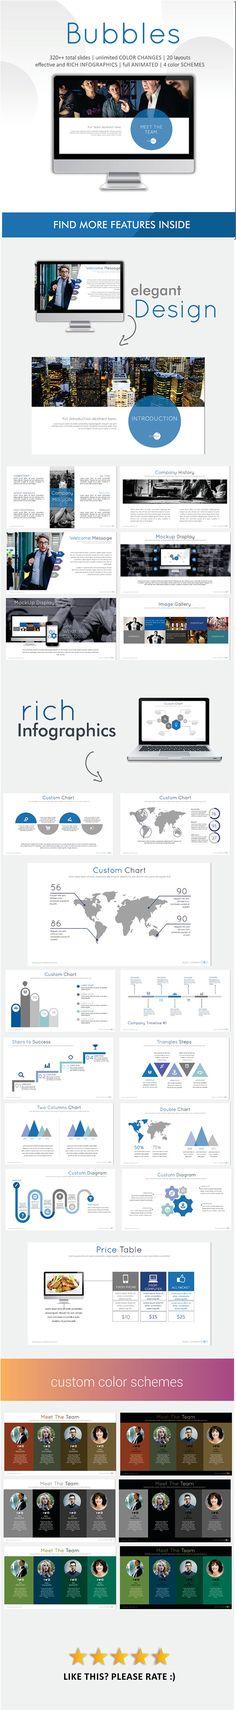 Bubbles PowerPoint Template #presentation Download: http://graphicriver.net/item/bubbles-powerpoint-template-/11591593?ref=ksioks